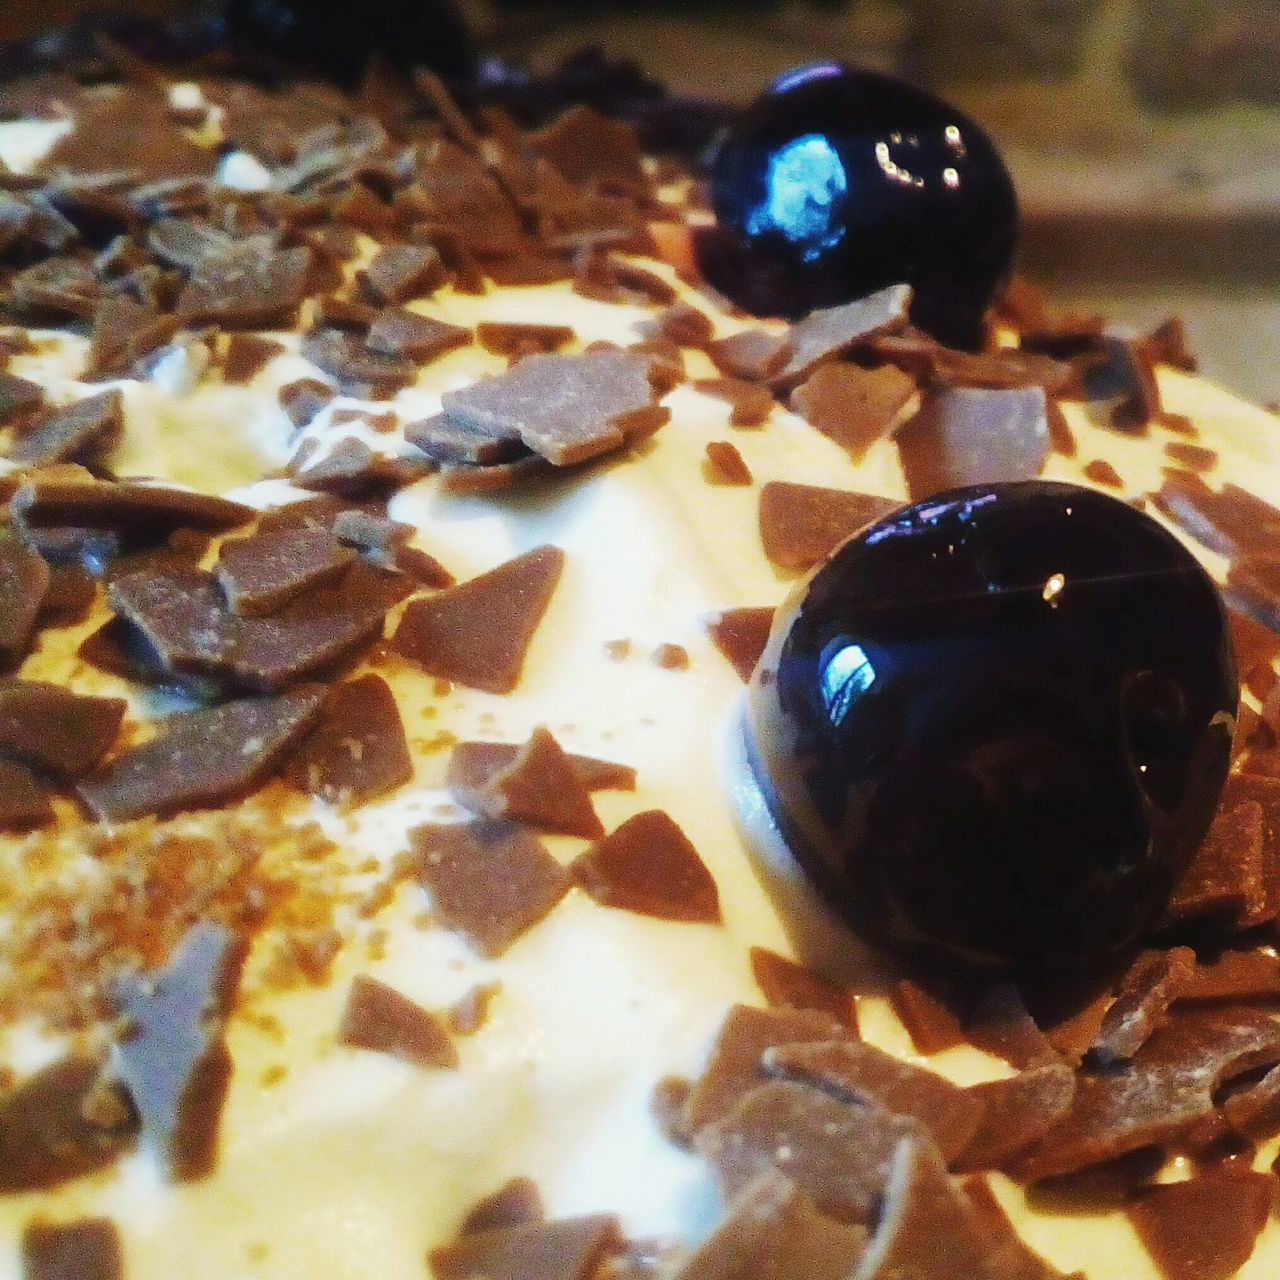 Black Forest Gateaux Cream Cake Chocolate Delicious Gluttony Rich